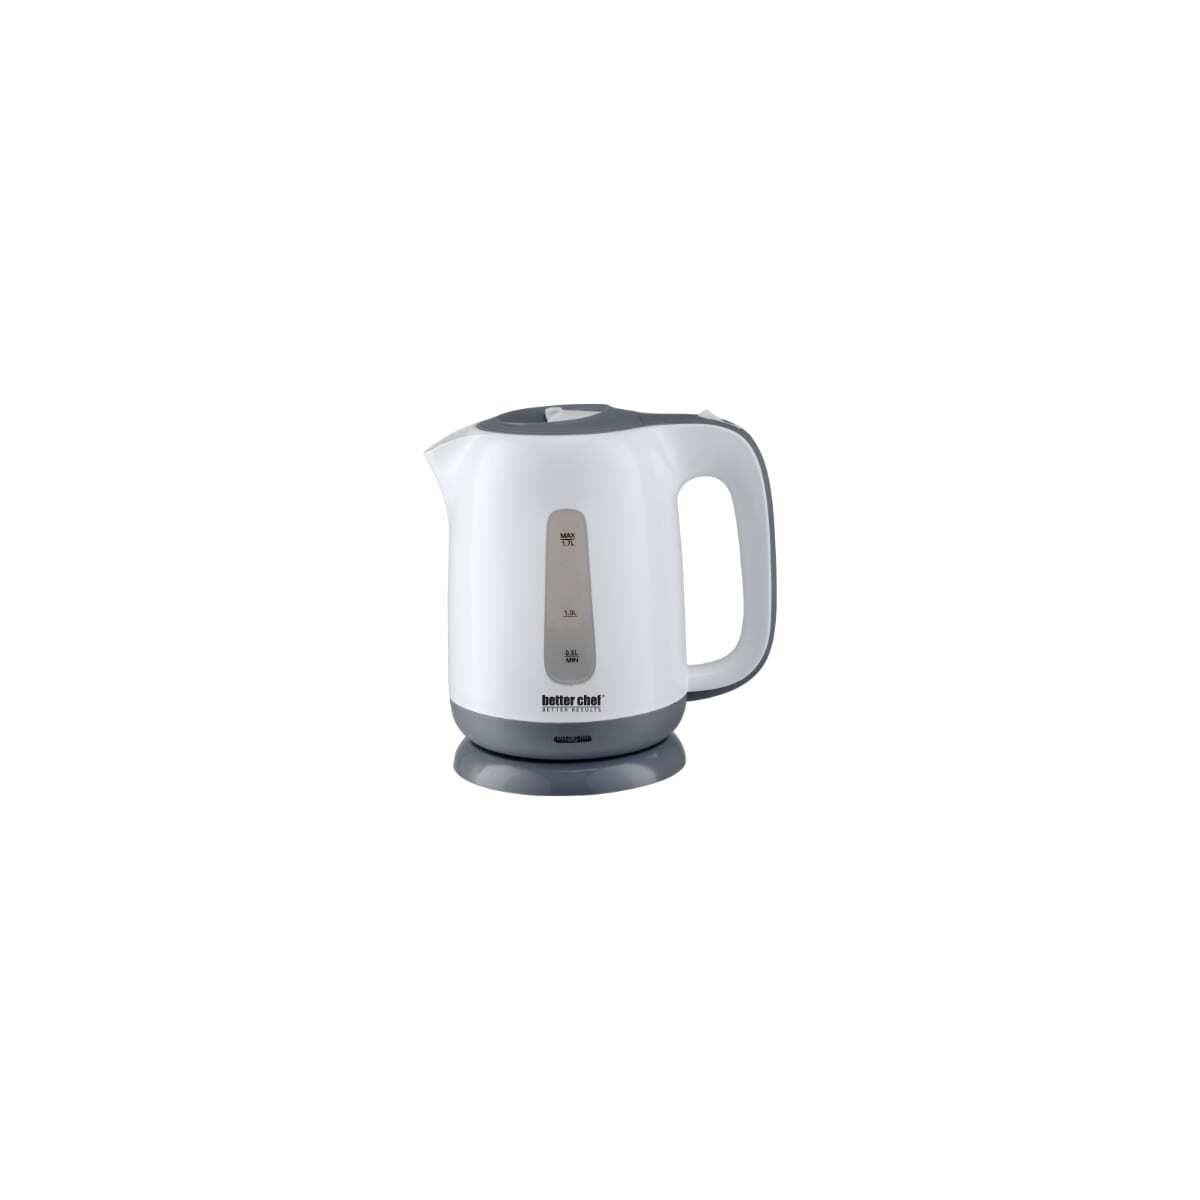 Cordless Electric Kettle White/Gray 1.7Litre